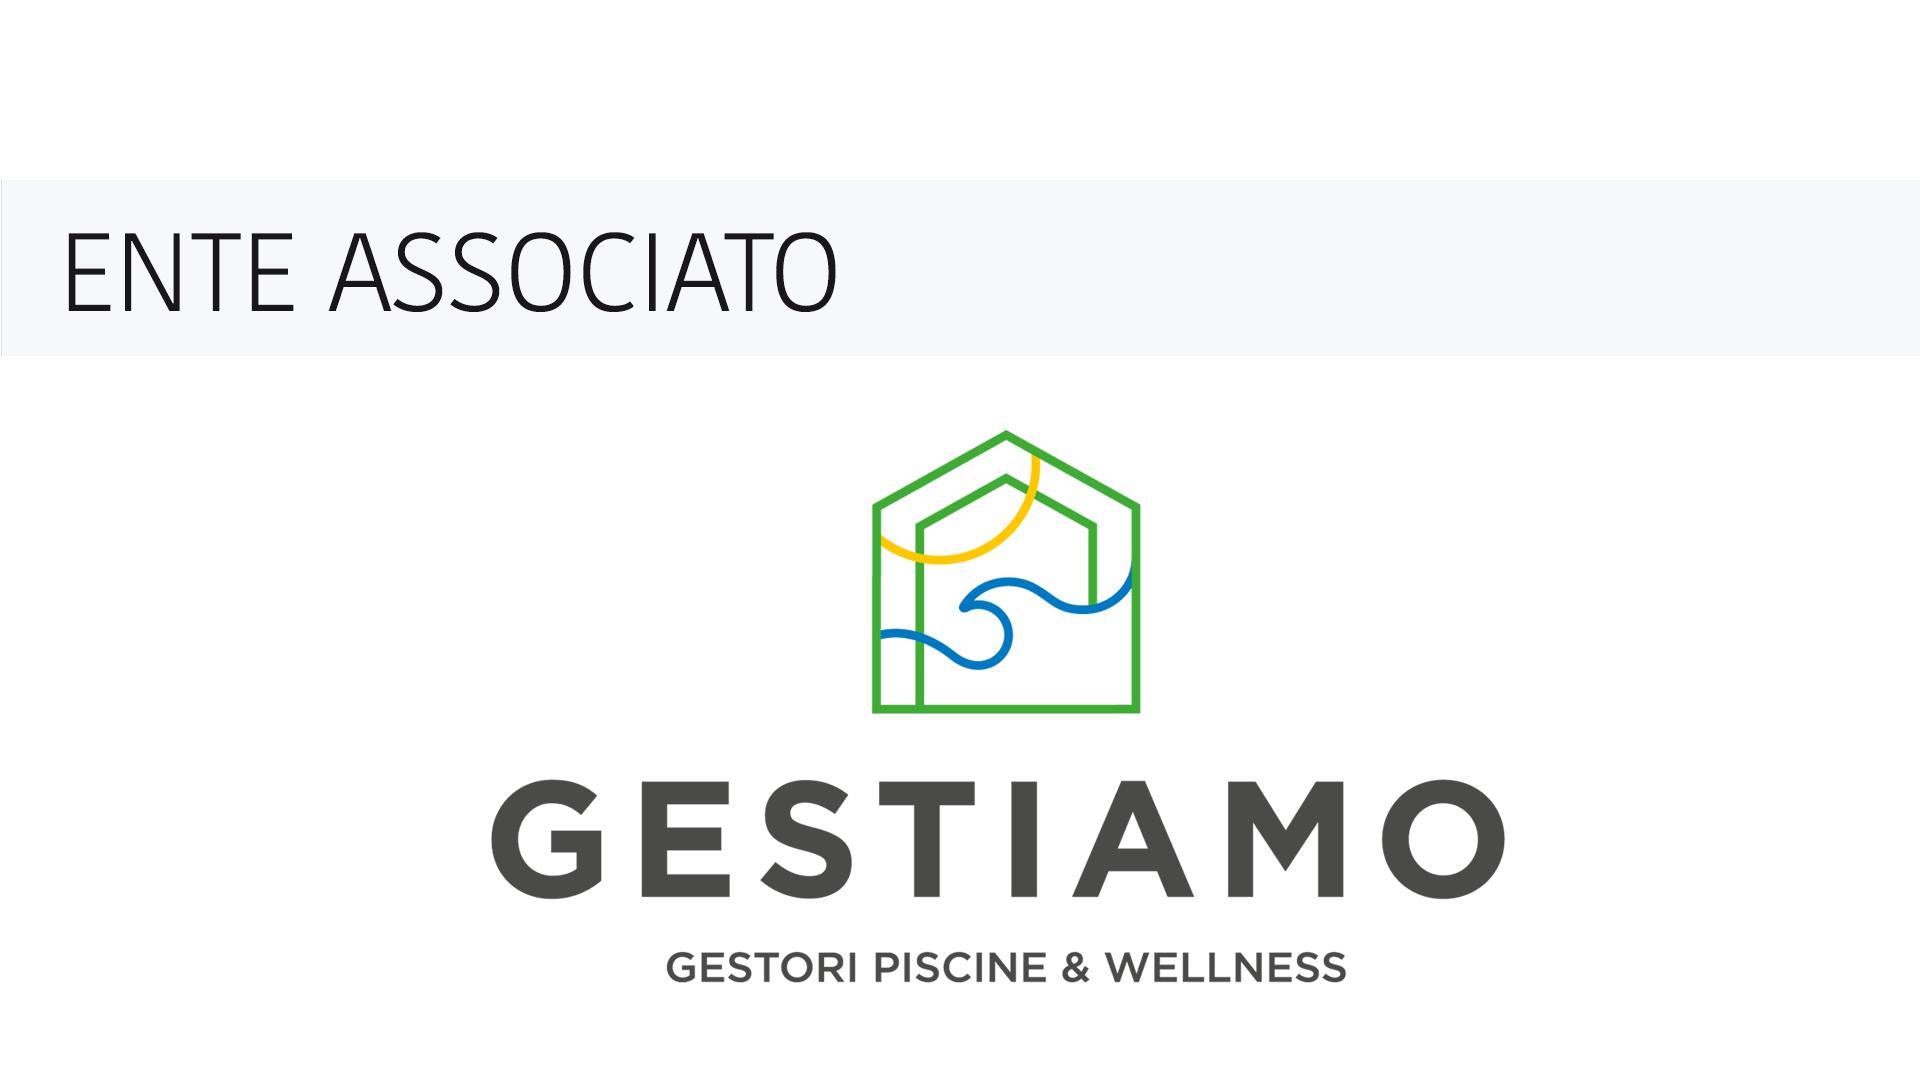 GESTIAMO-ENTE-ASSOCIATO